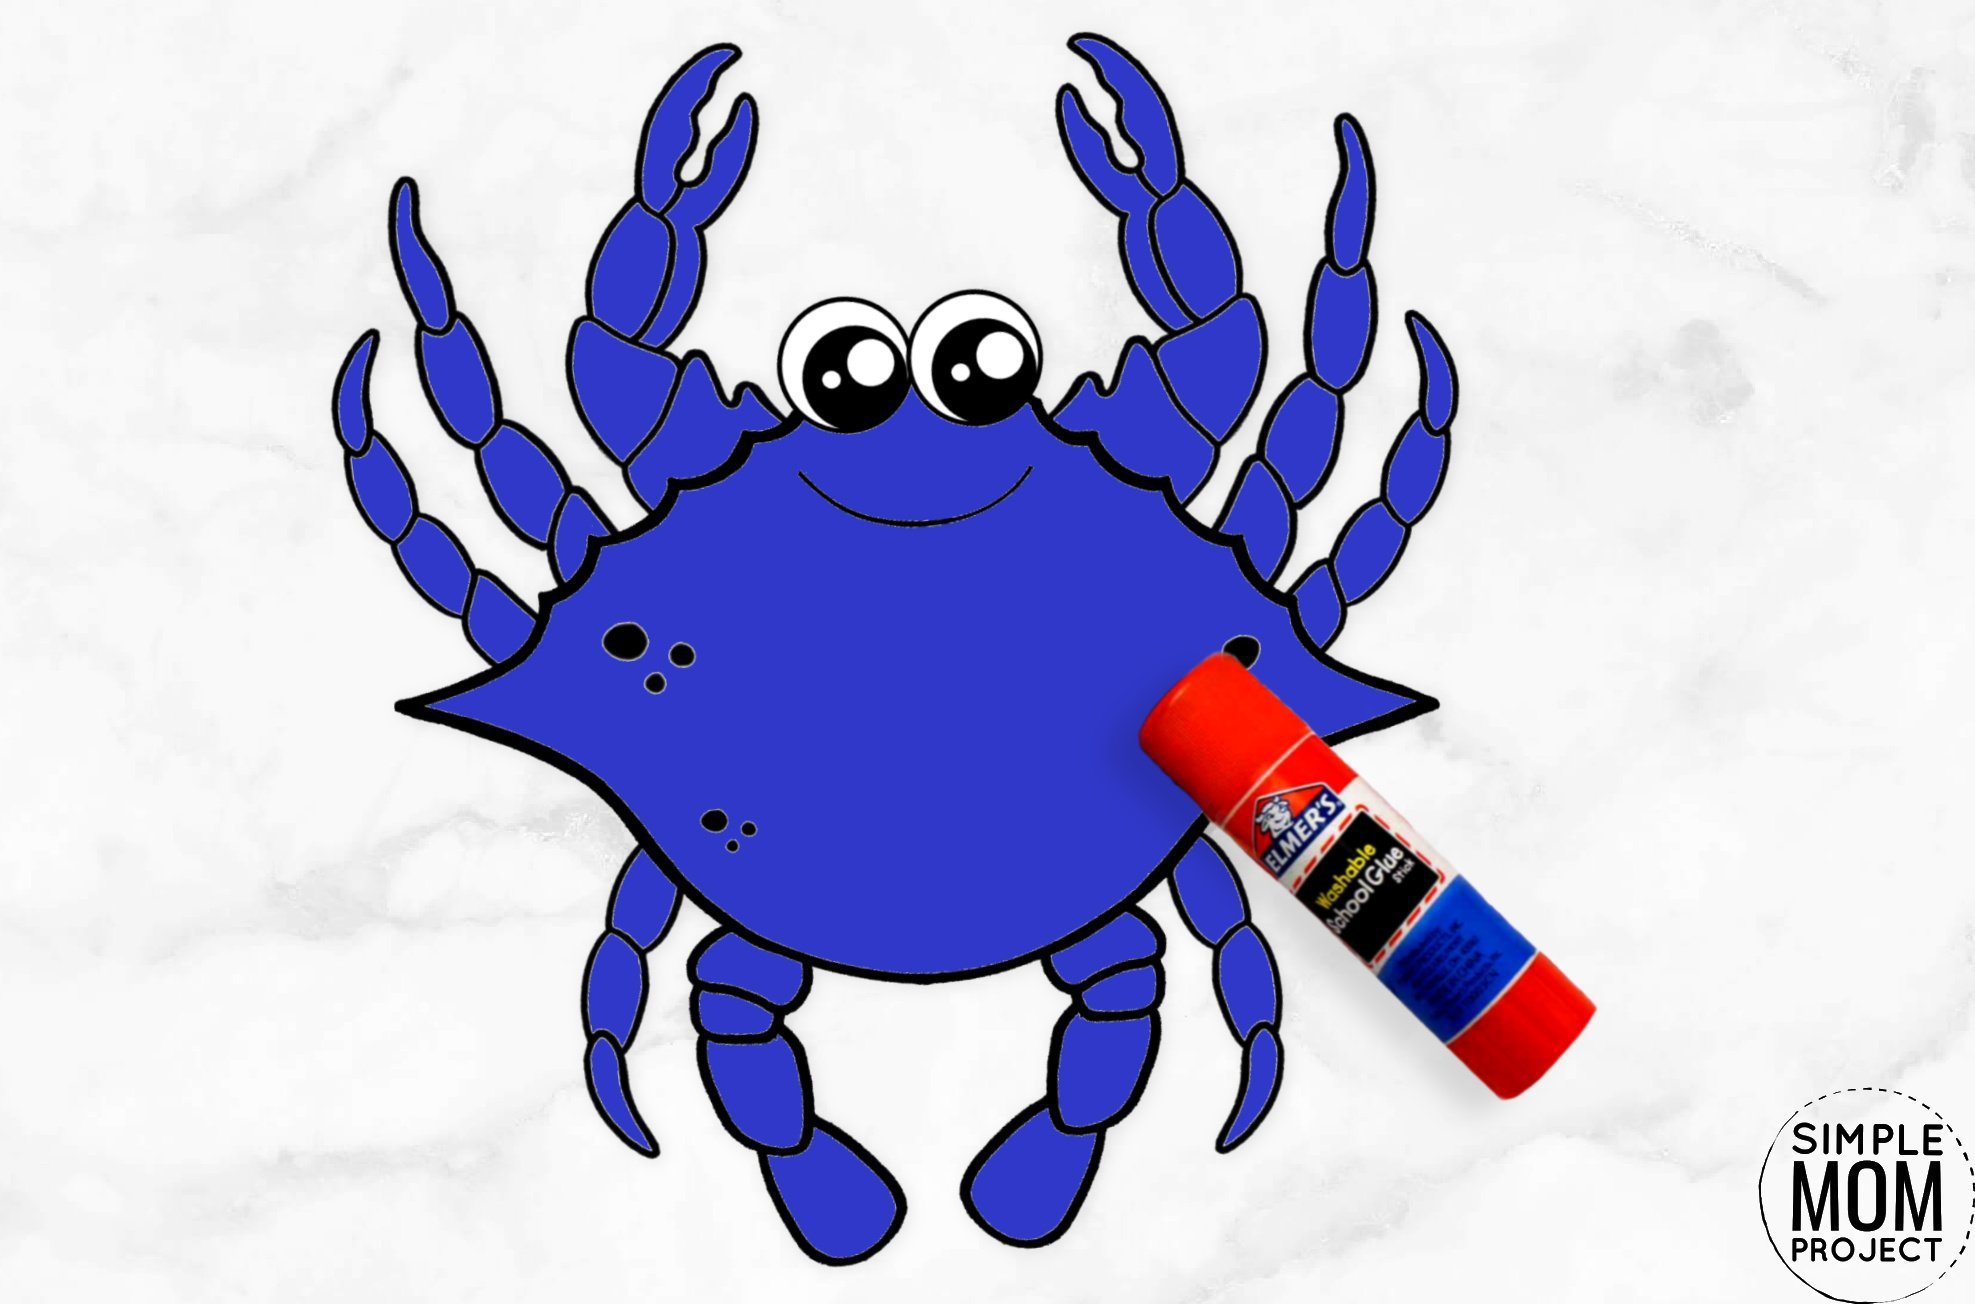 Free Printable Blue Crab Ocean Animal Craft for Kids, preschoolers and toddlers